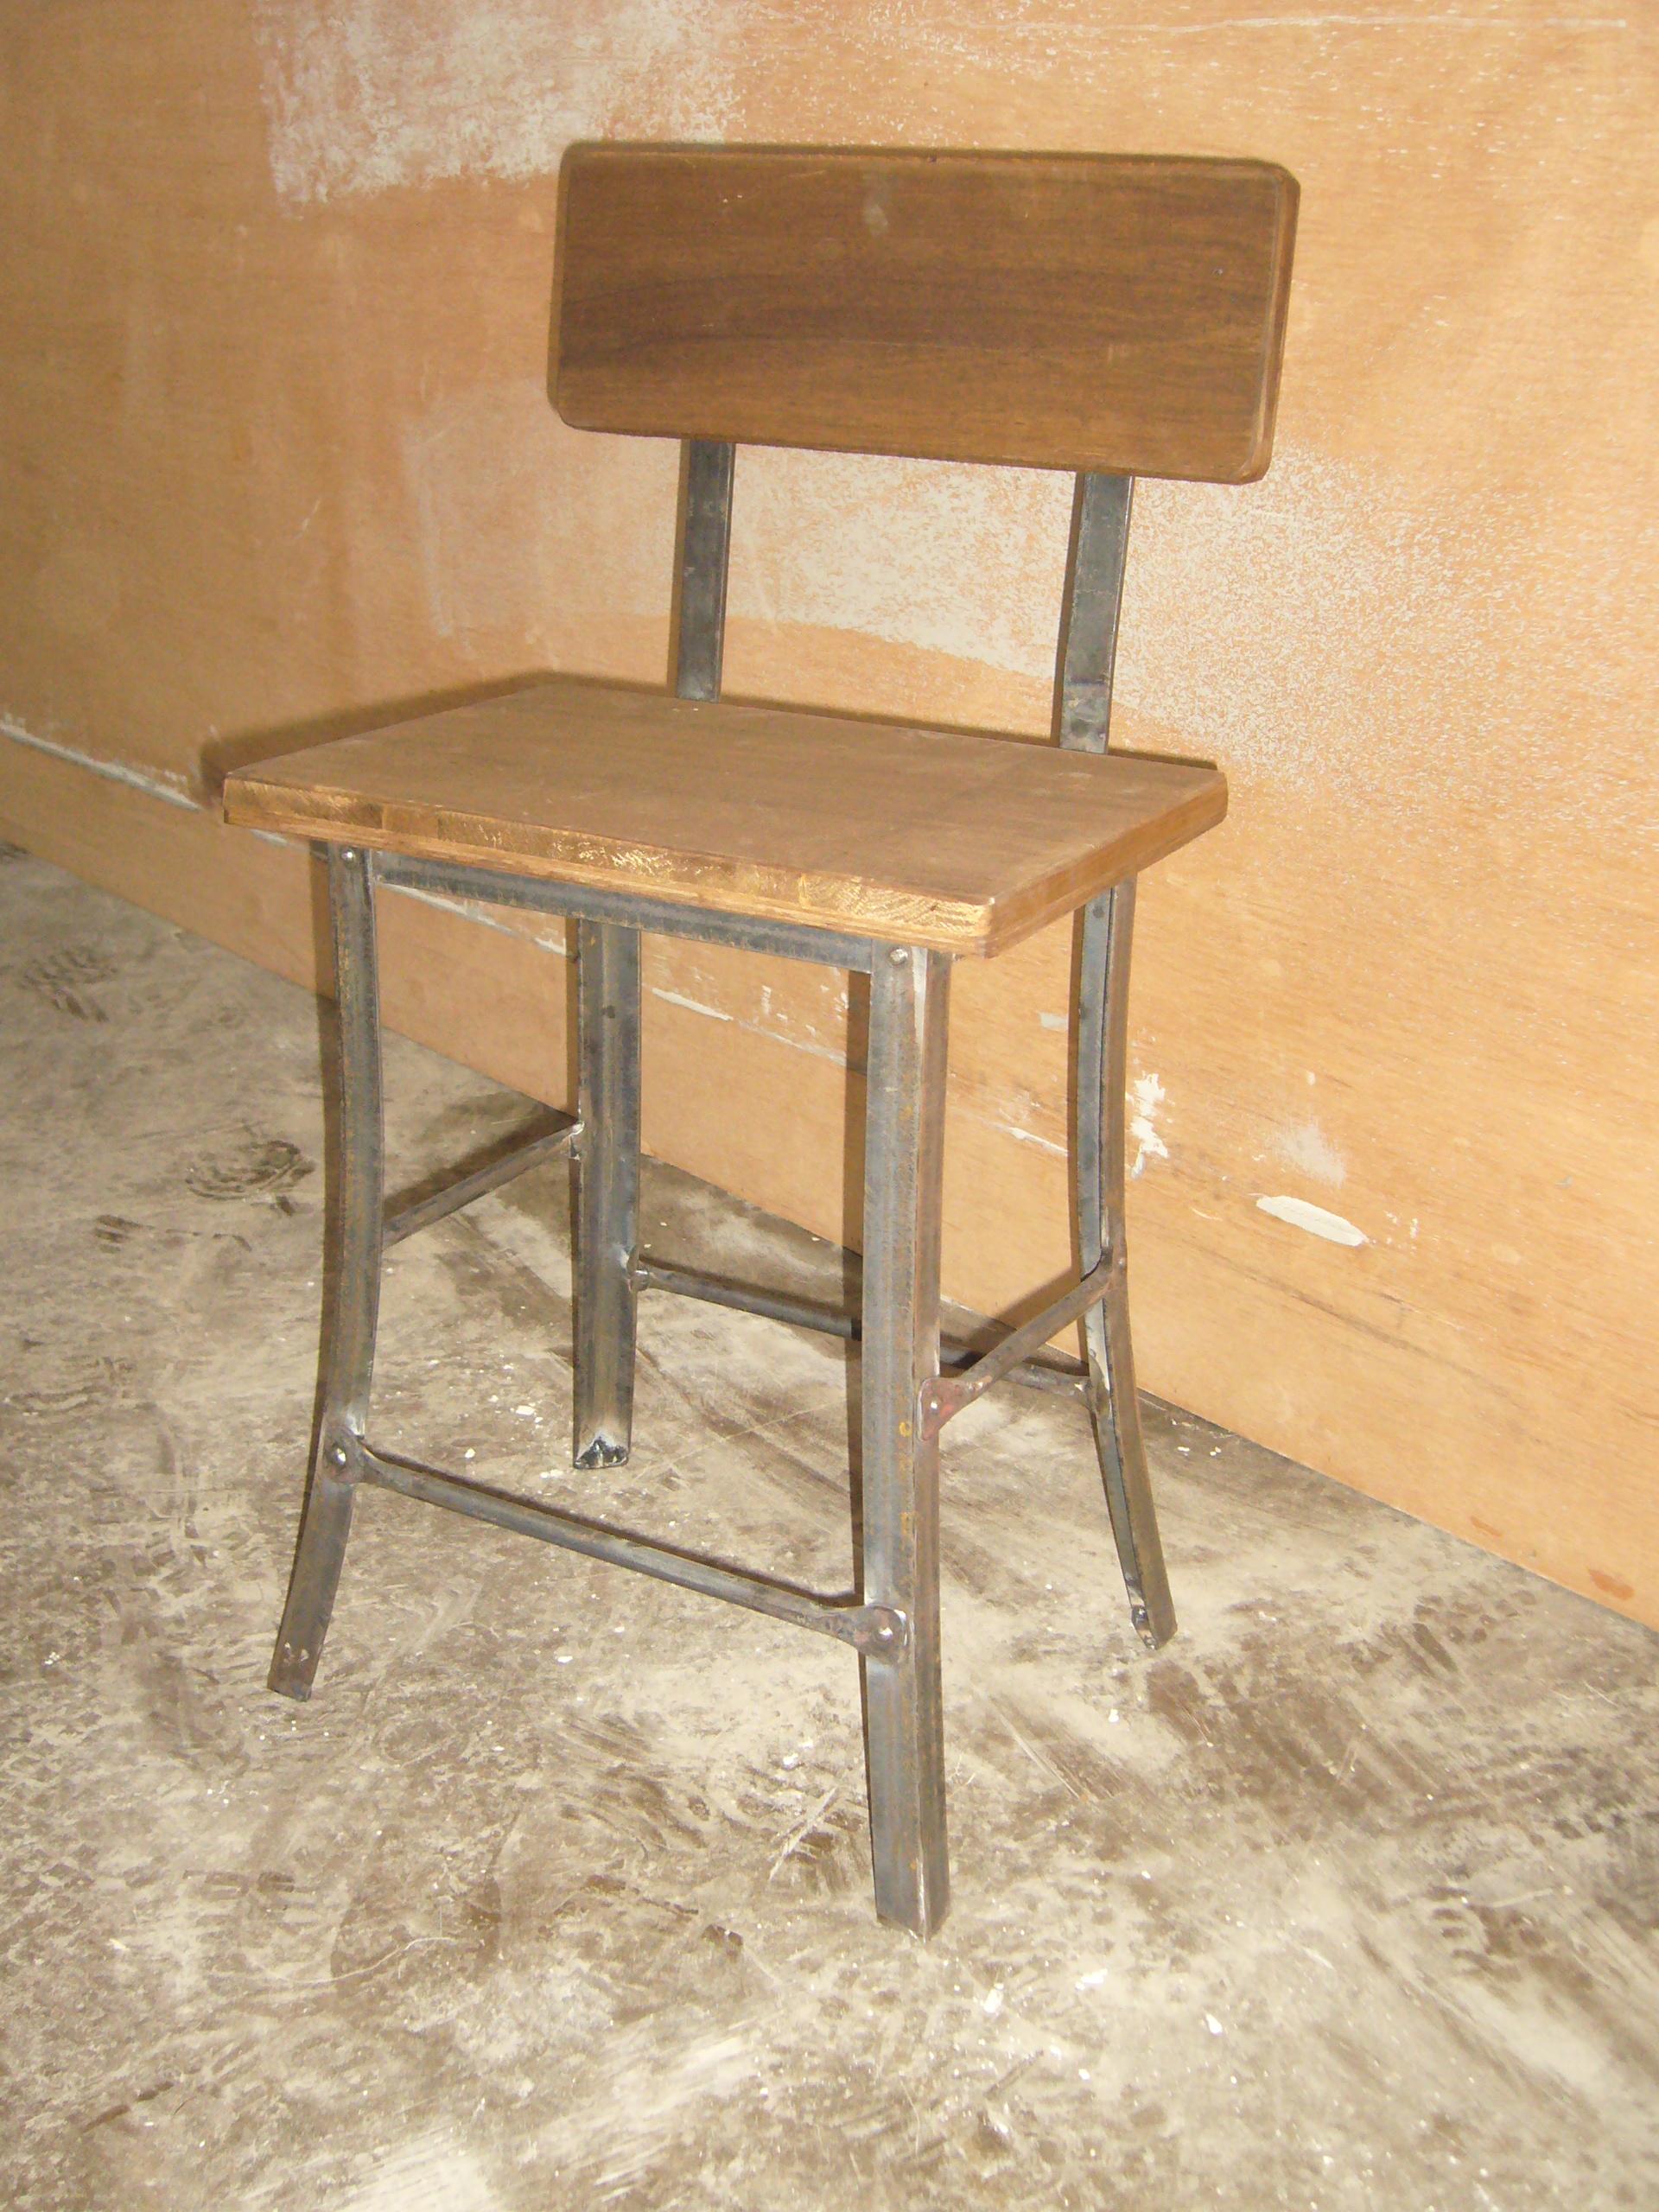 petite-chaise